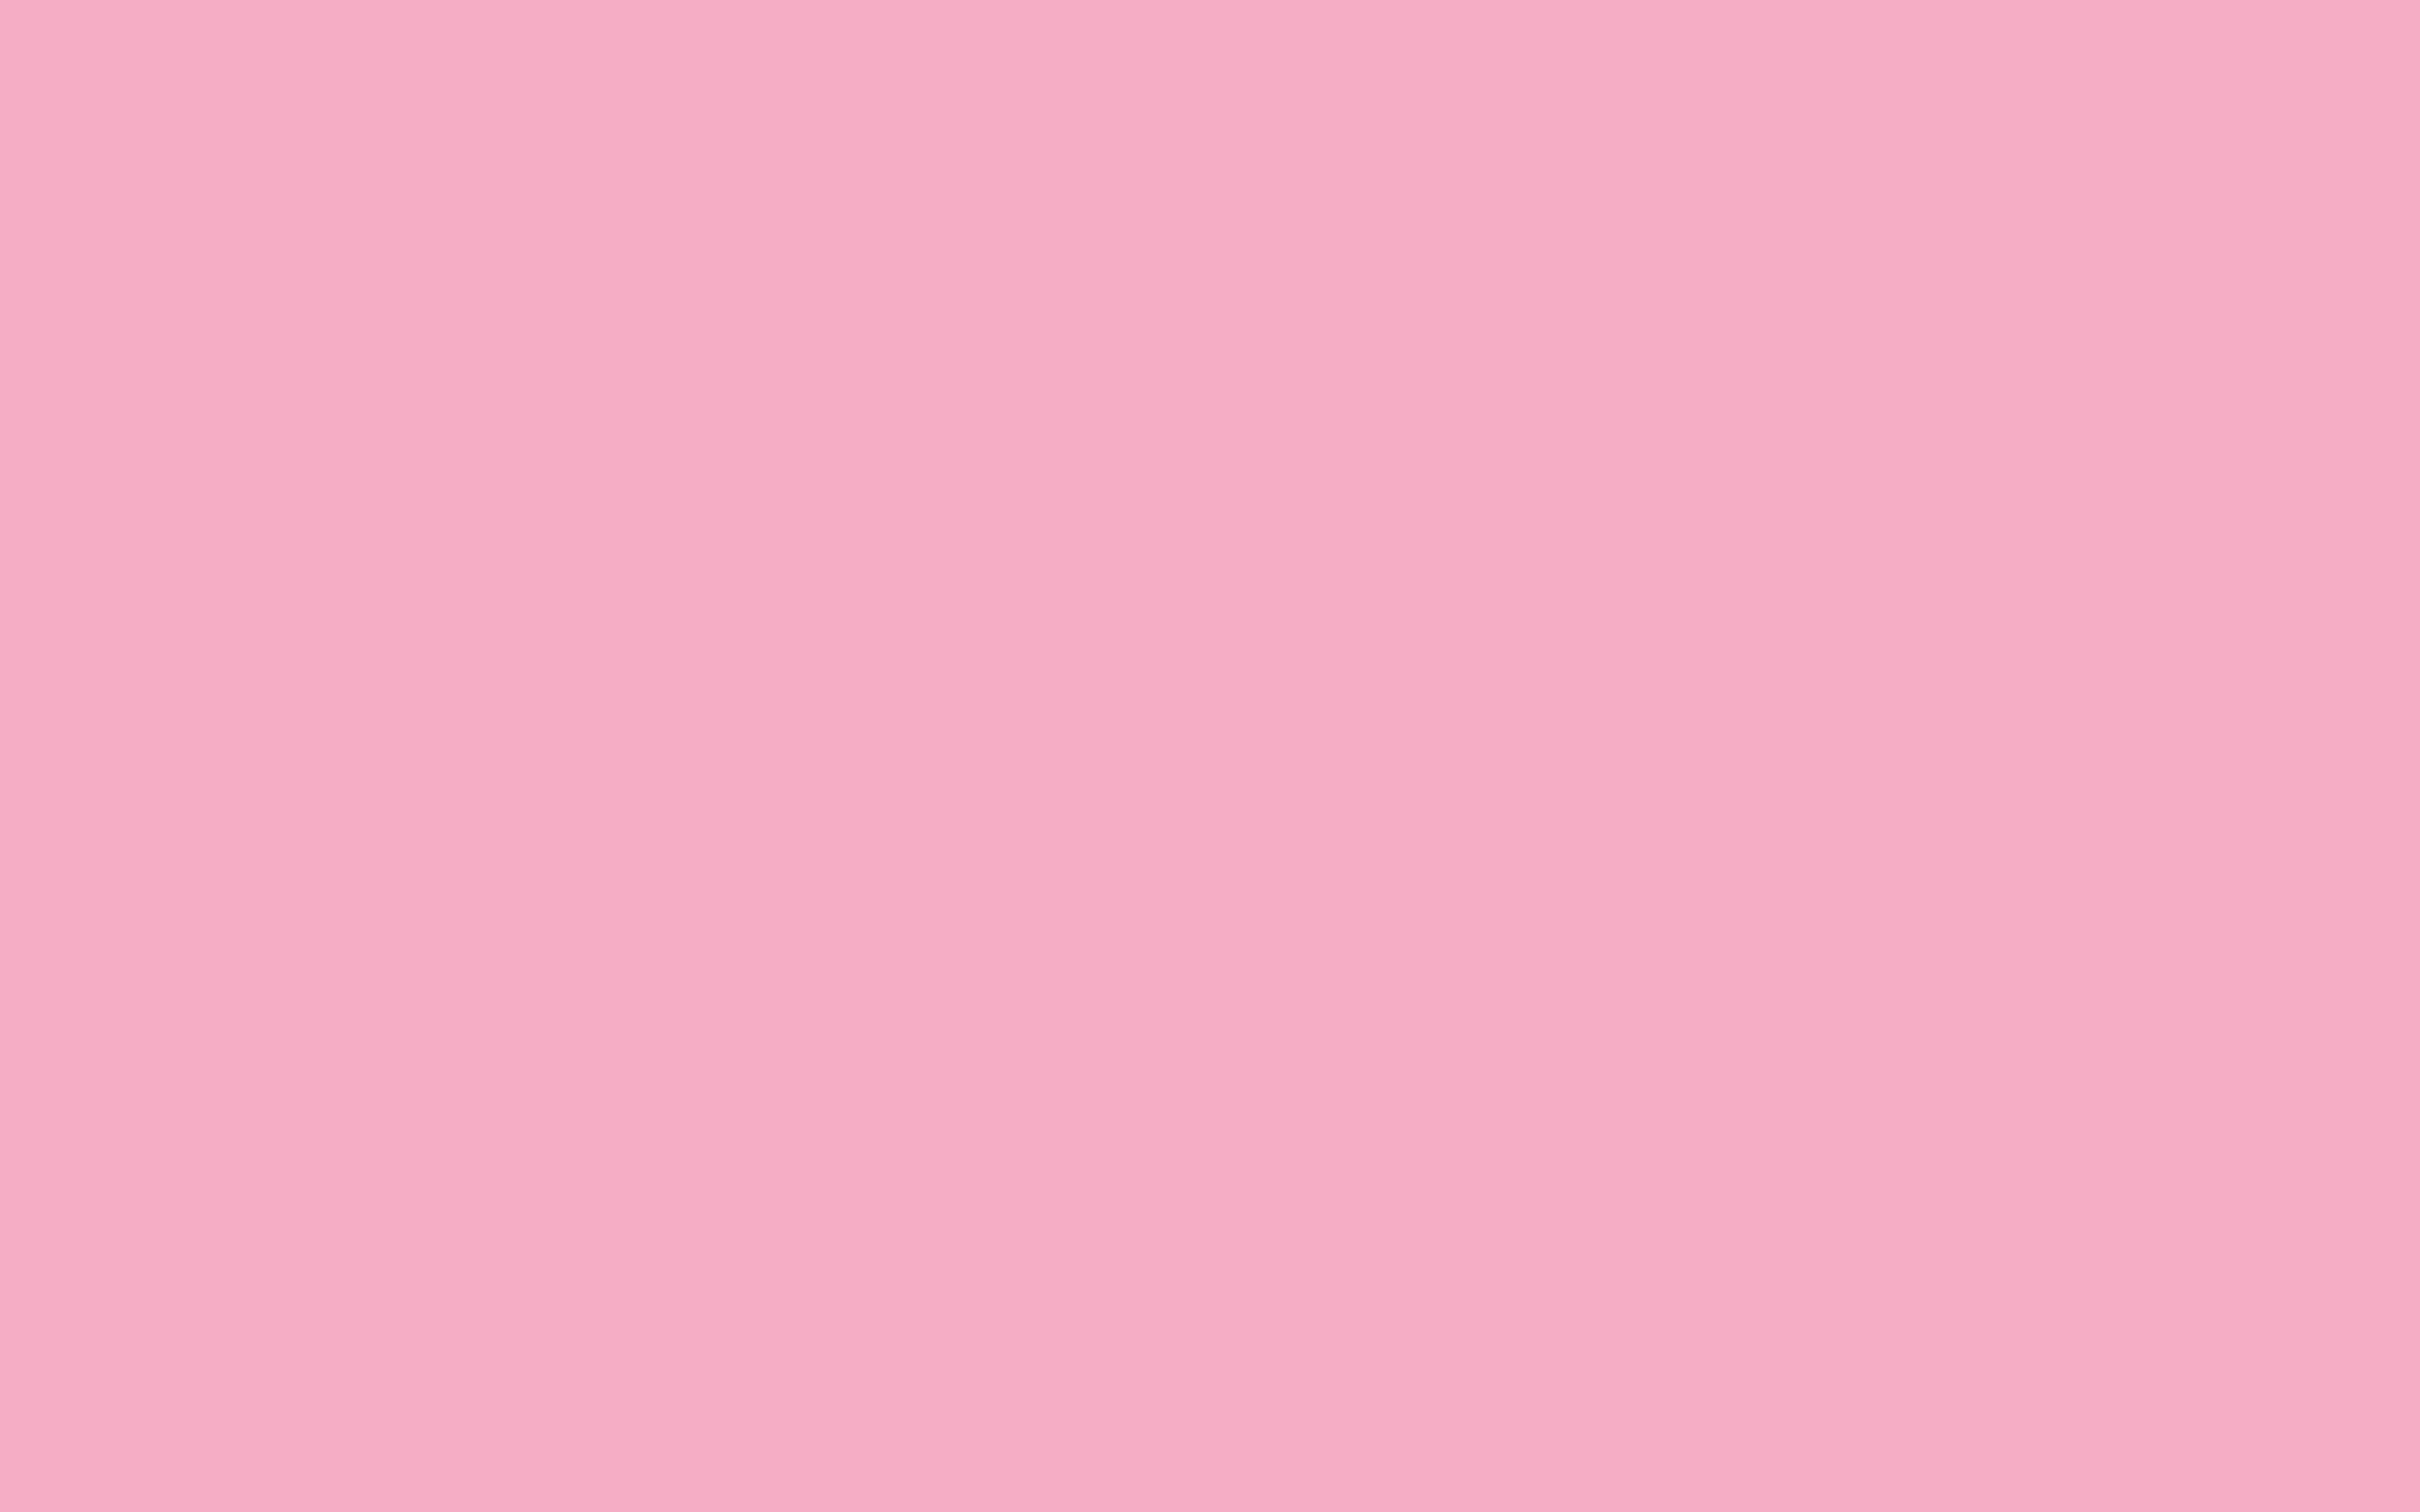 2560x1600 Nadeshiko Pink Solid Color Background